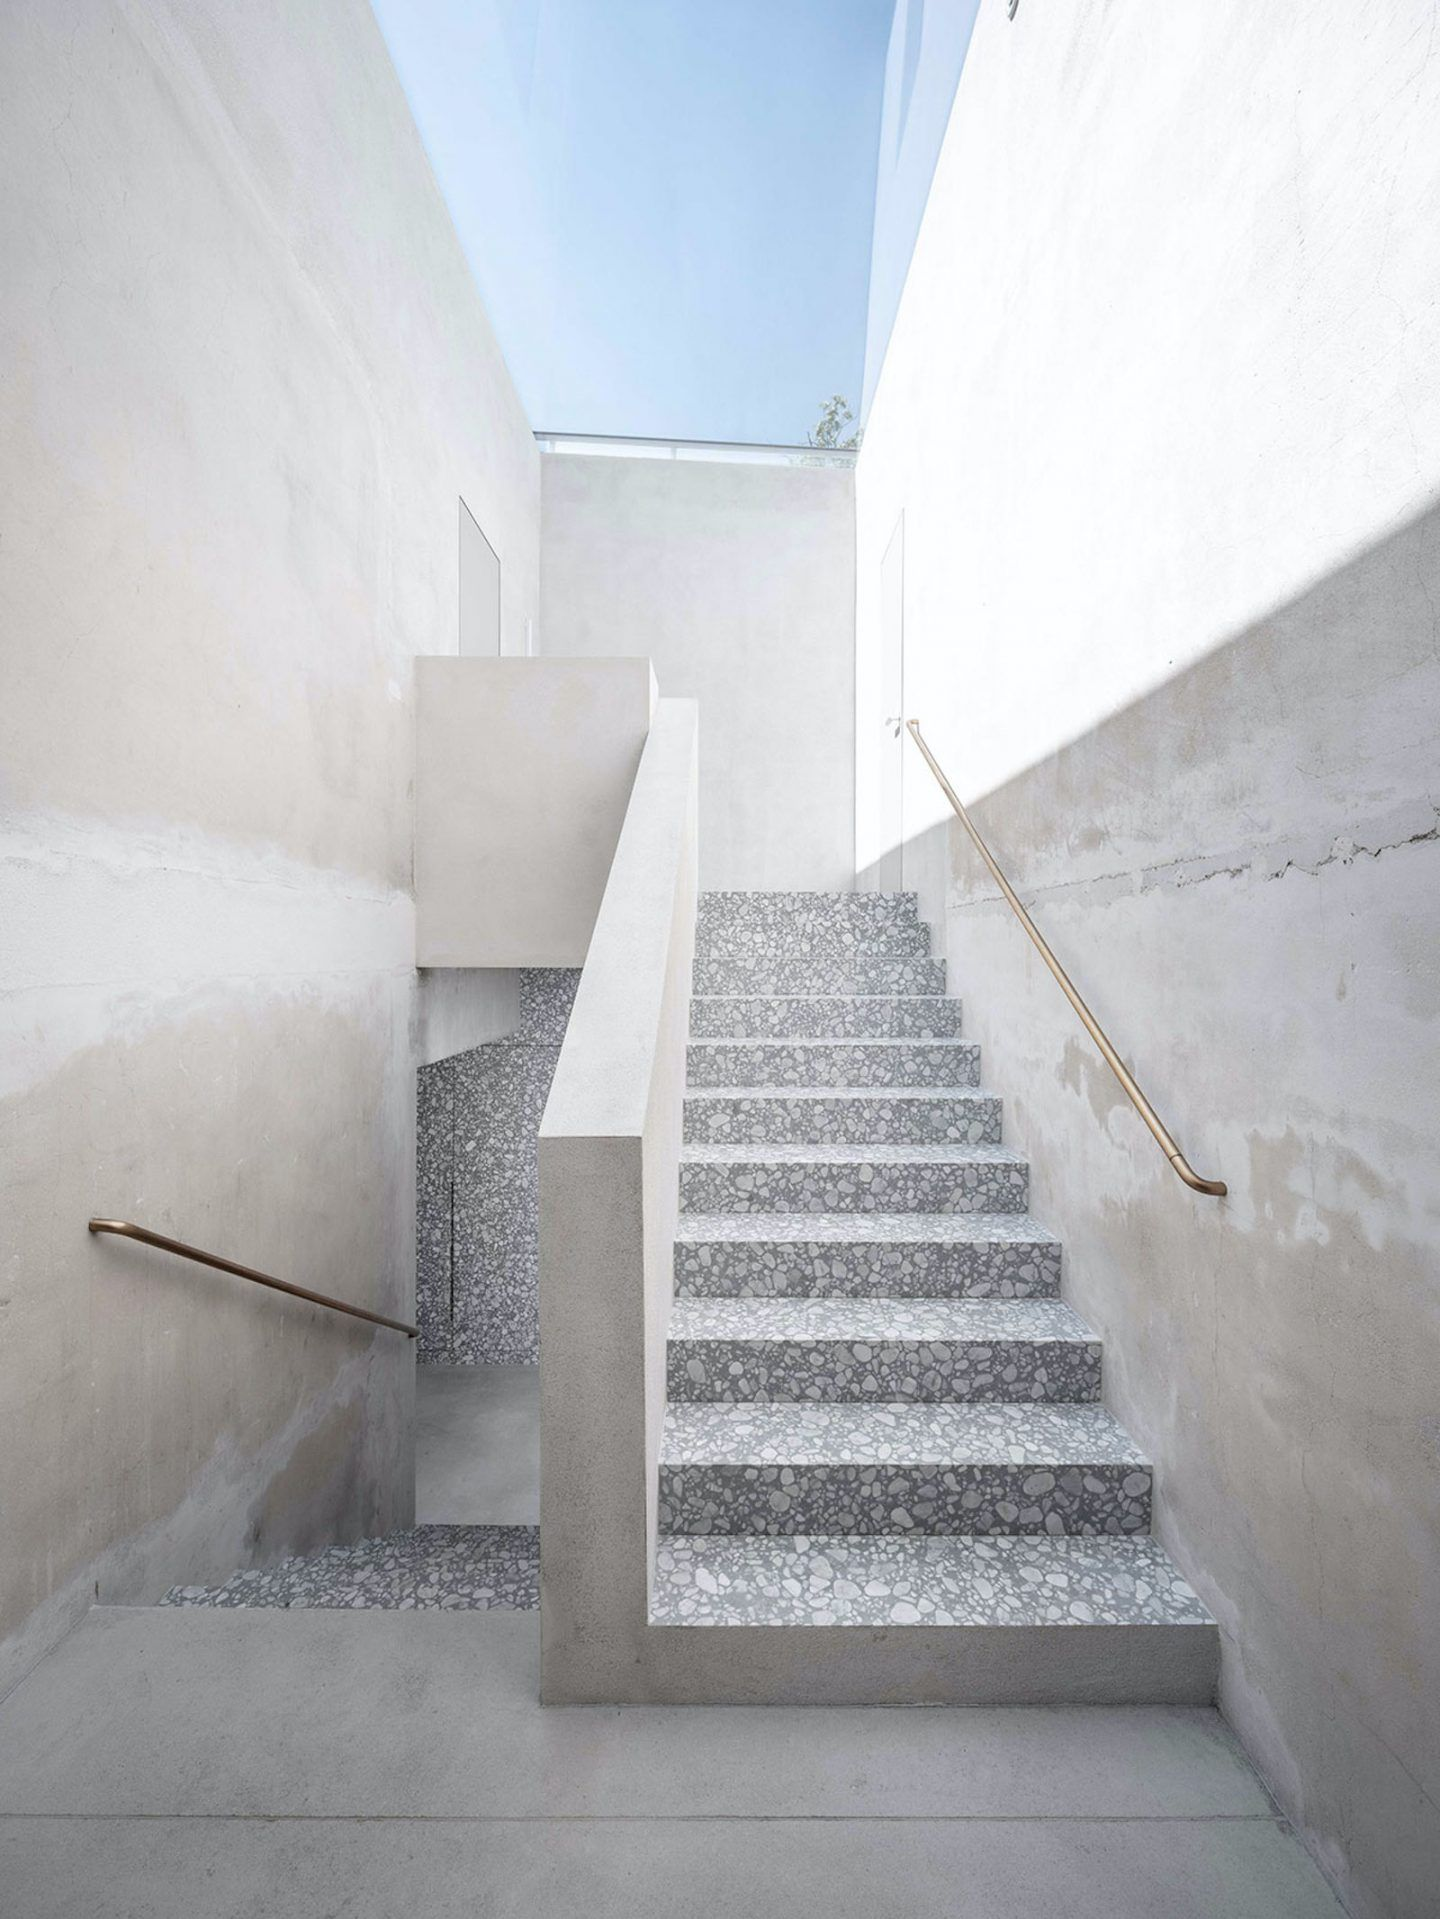 IGNANT-Architecture-JMayerH-Casa-Morgana-018